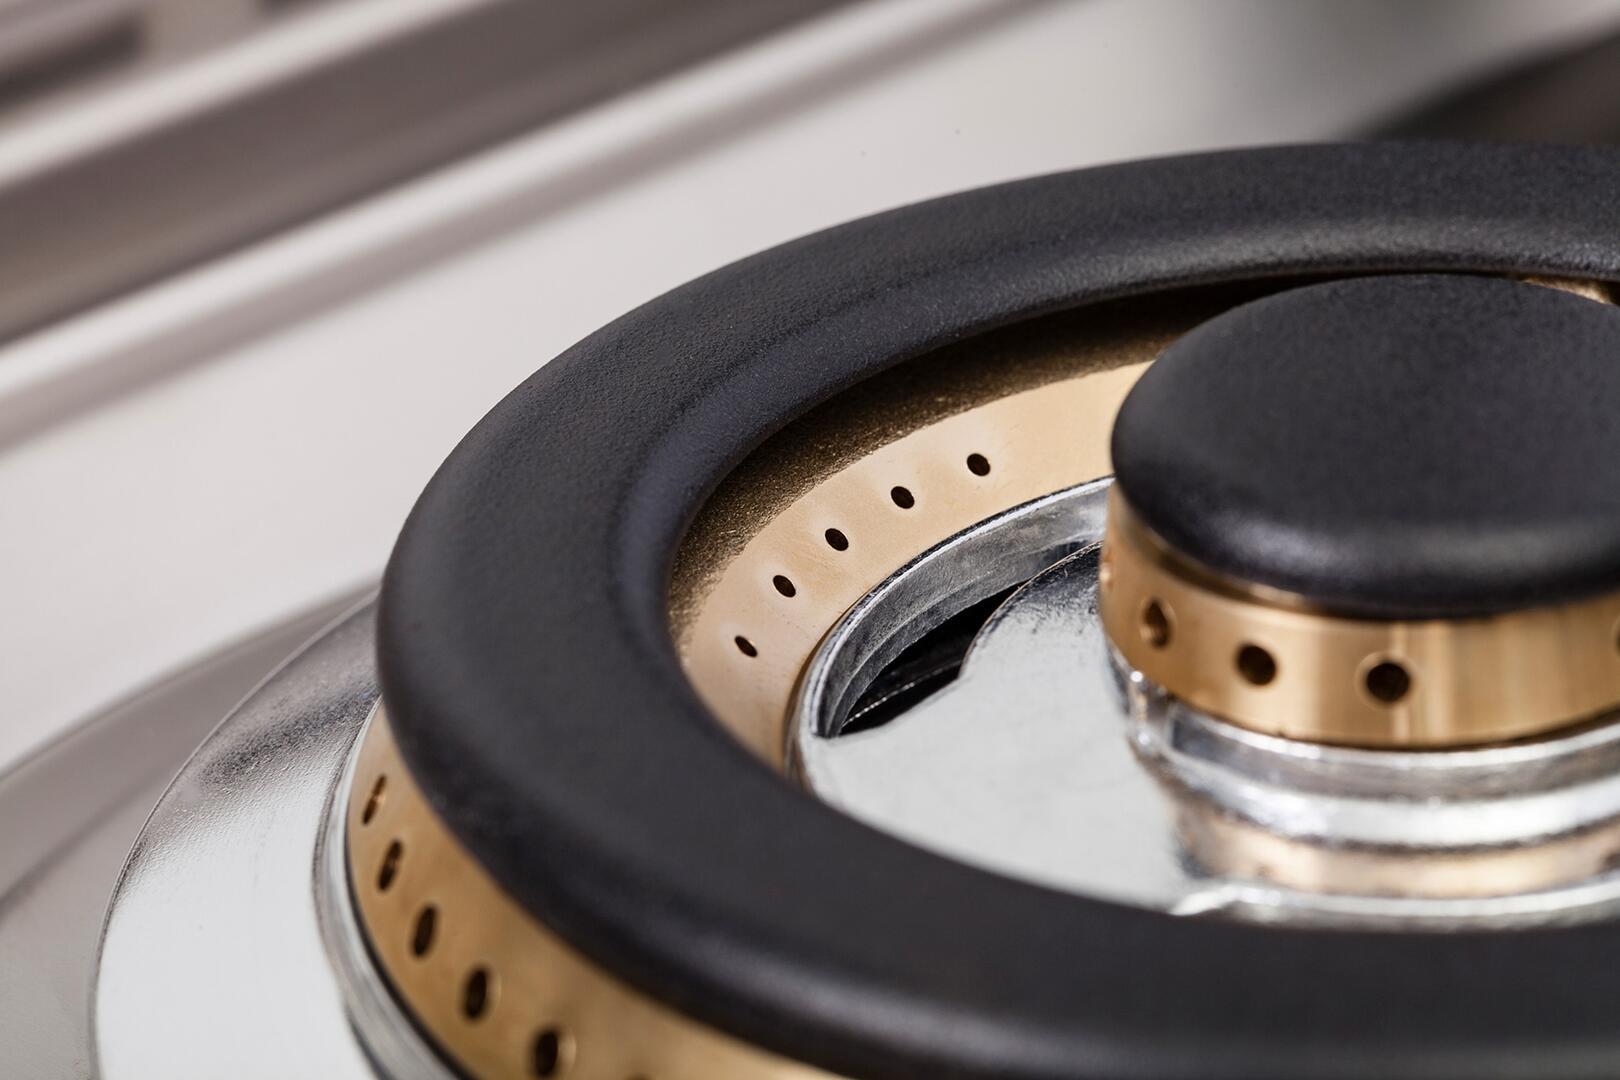 Ilve Professional Plus UPDW100FDMPMLP Freestanding Dual Fuel Range Gray, Burner View